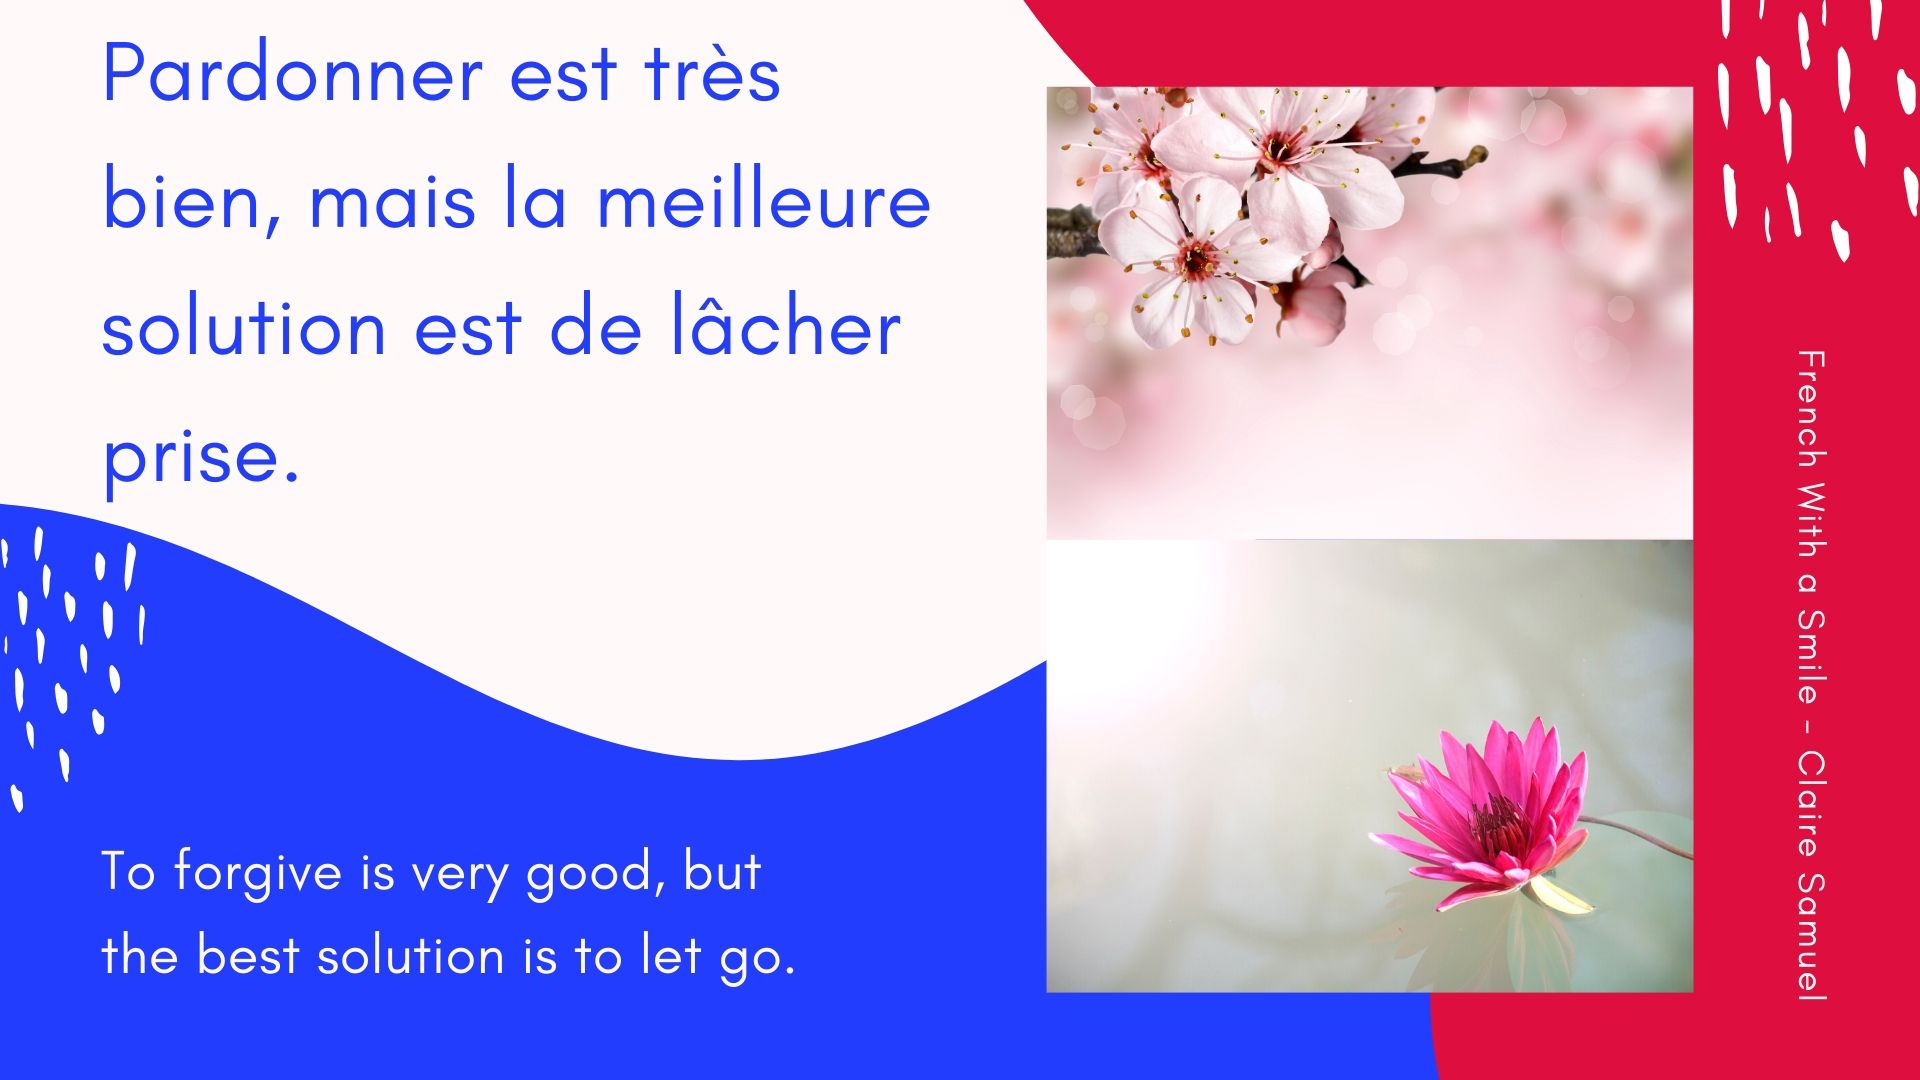 Advanced #6 Good Better in #French bon meilleur bien mieux